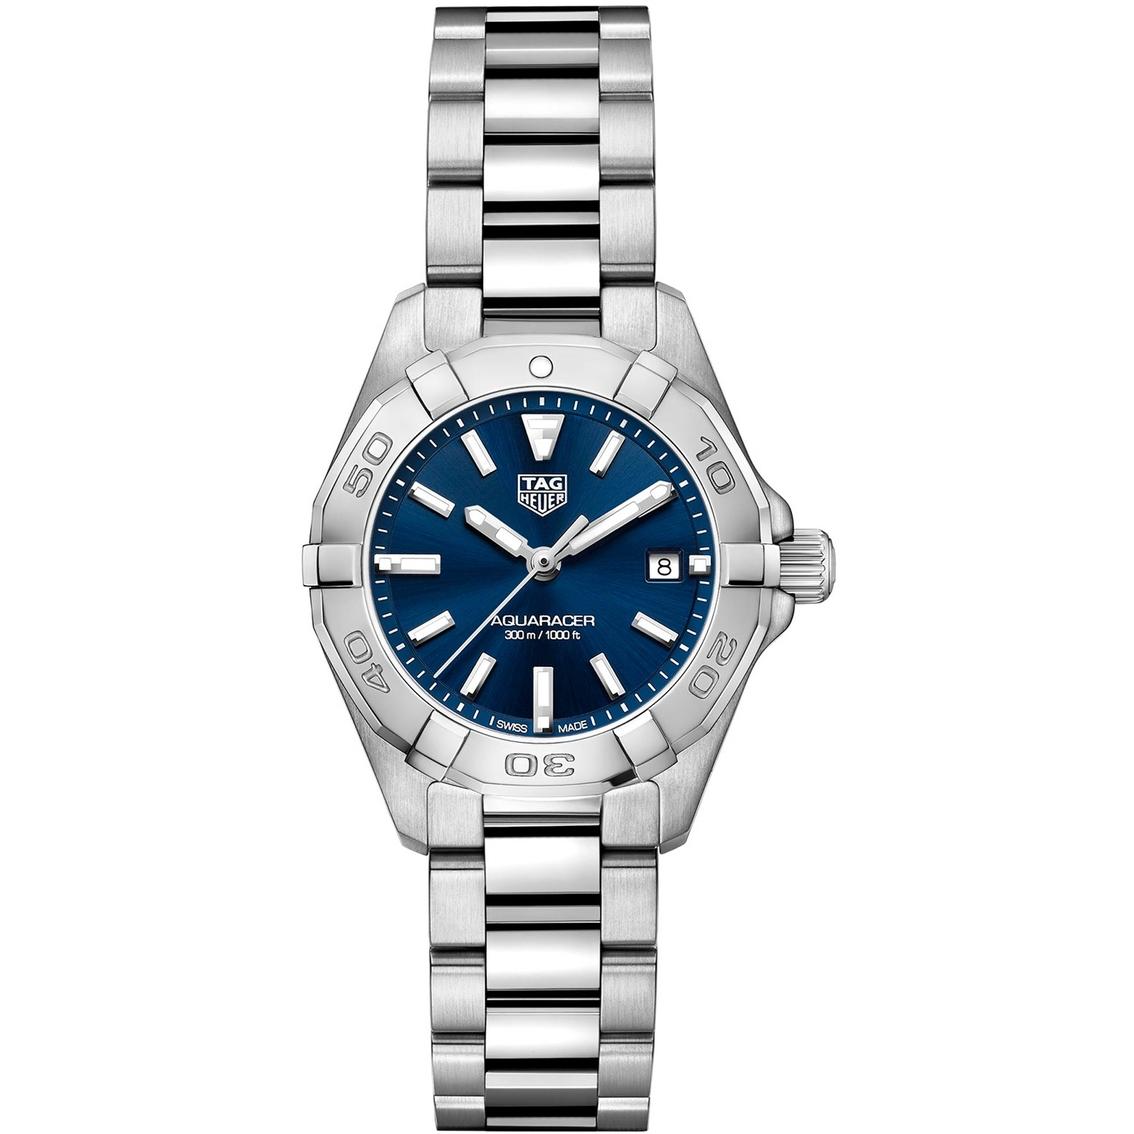 962f5e60ac4 Tag Heuer Women s Aquaracer Quartz Watch Wbd1412ba0741